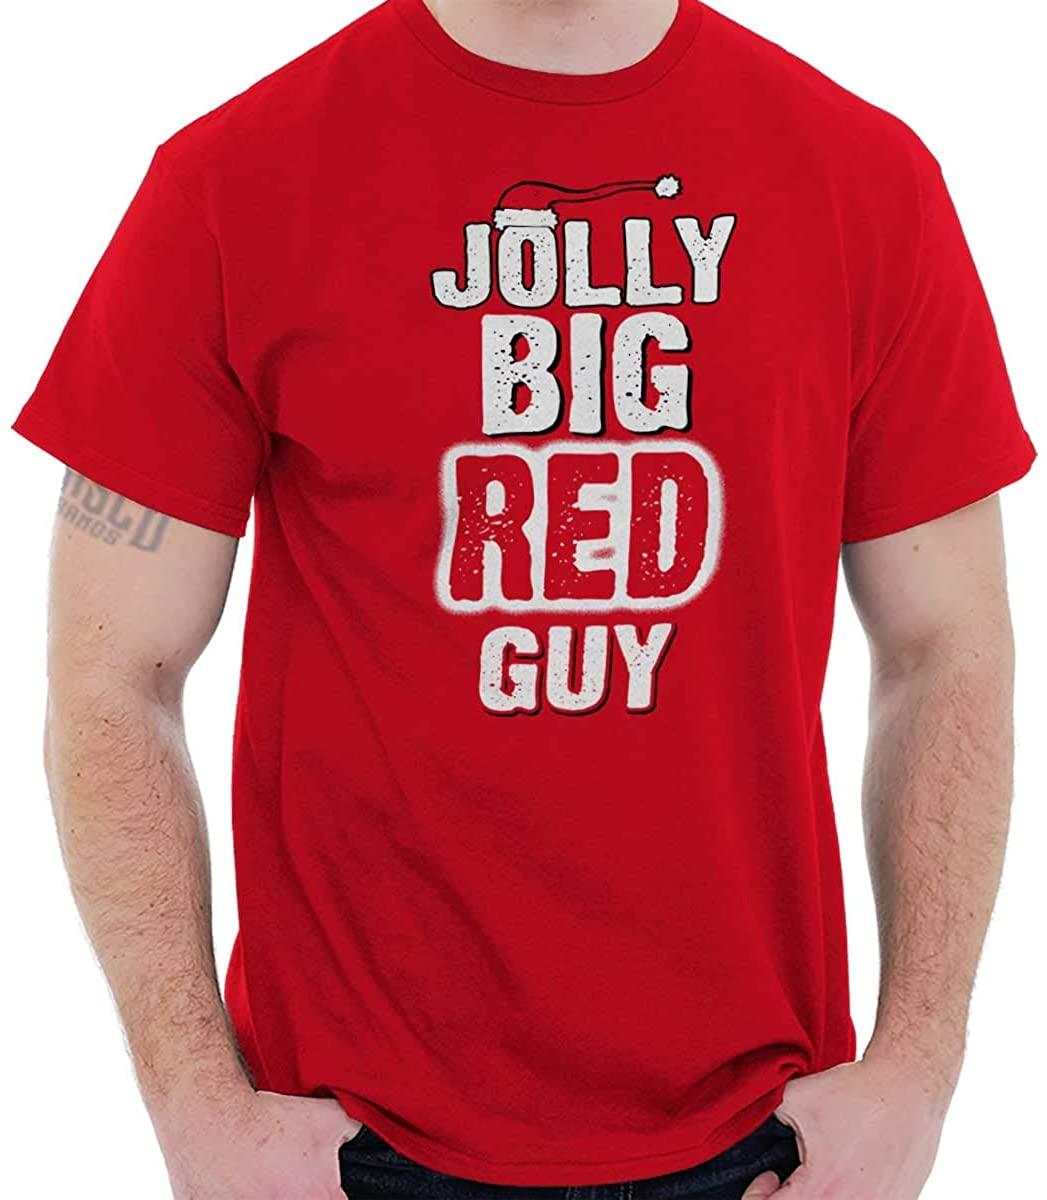 Jolly Big Red Guy Christmas T Shirt for Men